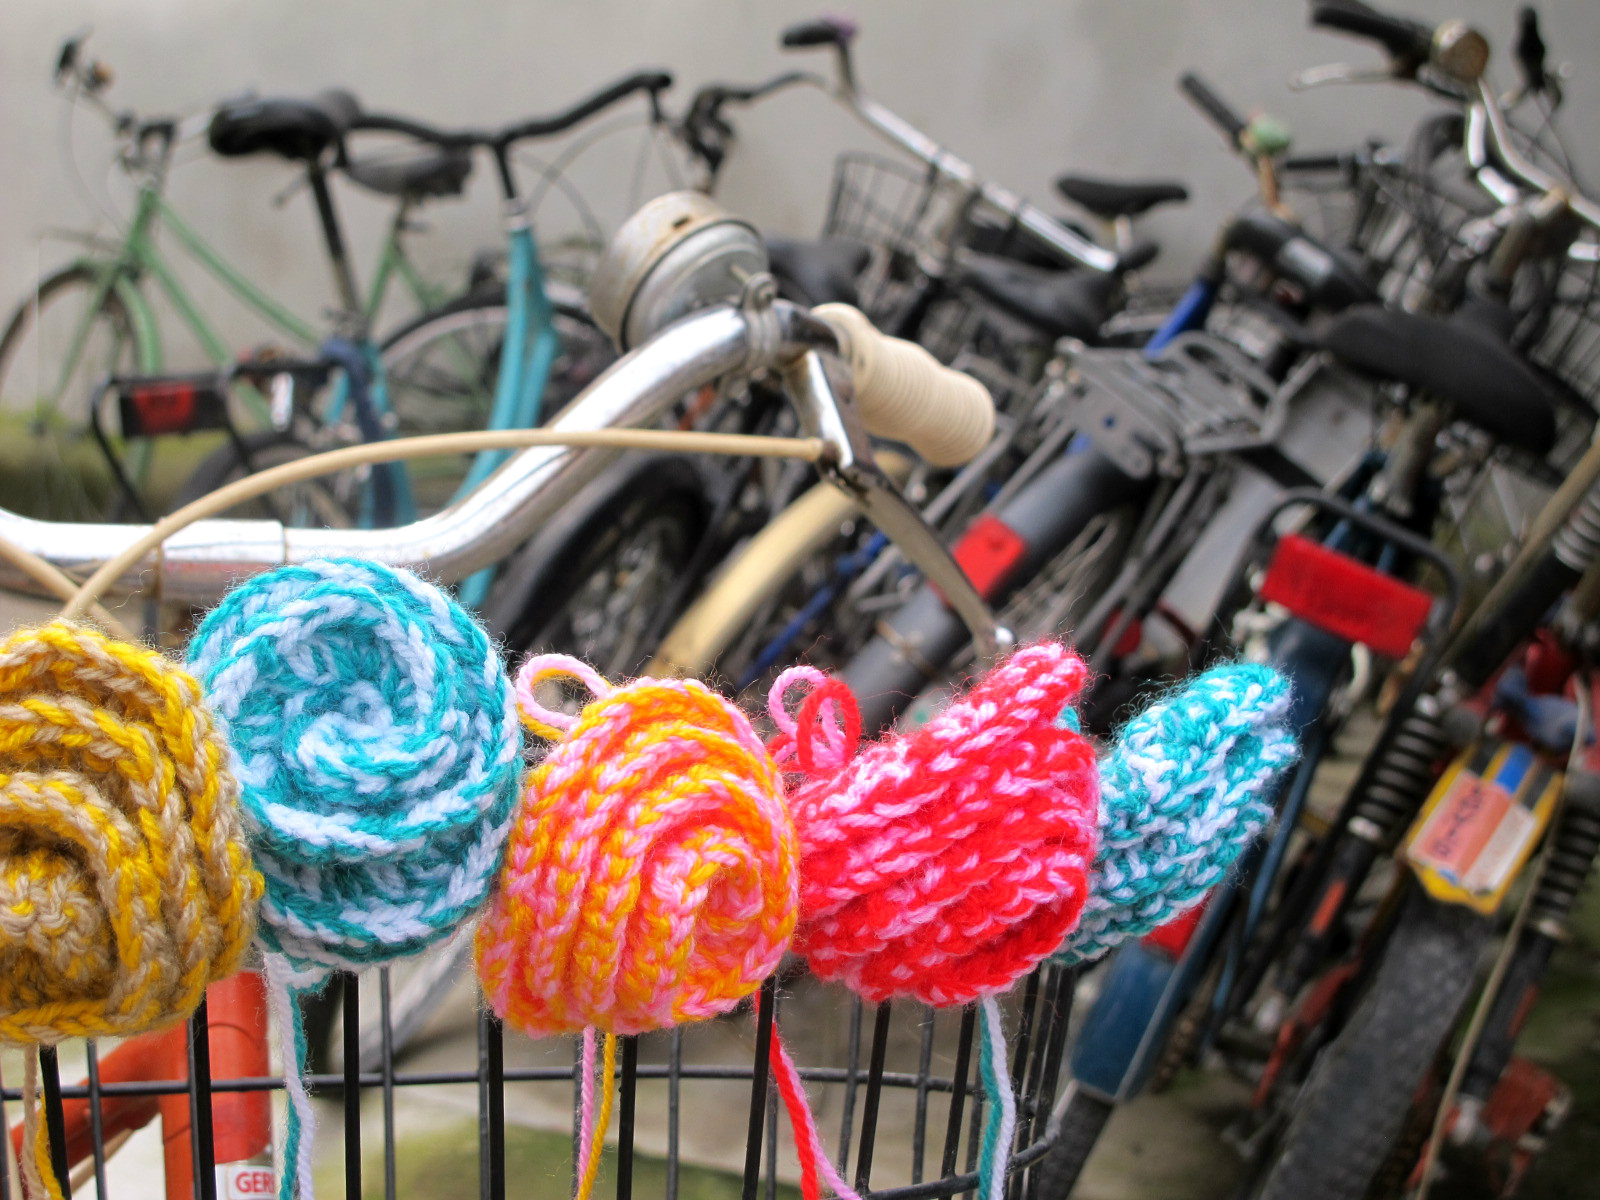 Flower power à vélo!